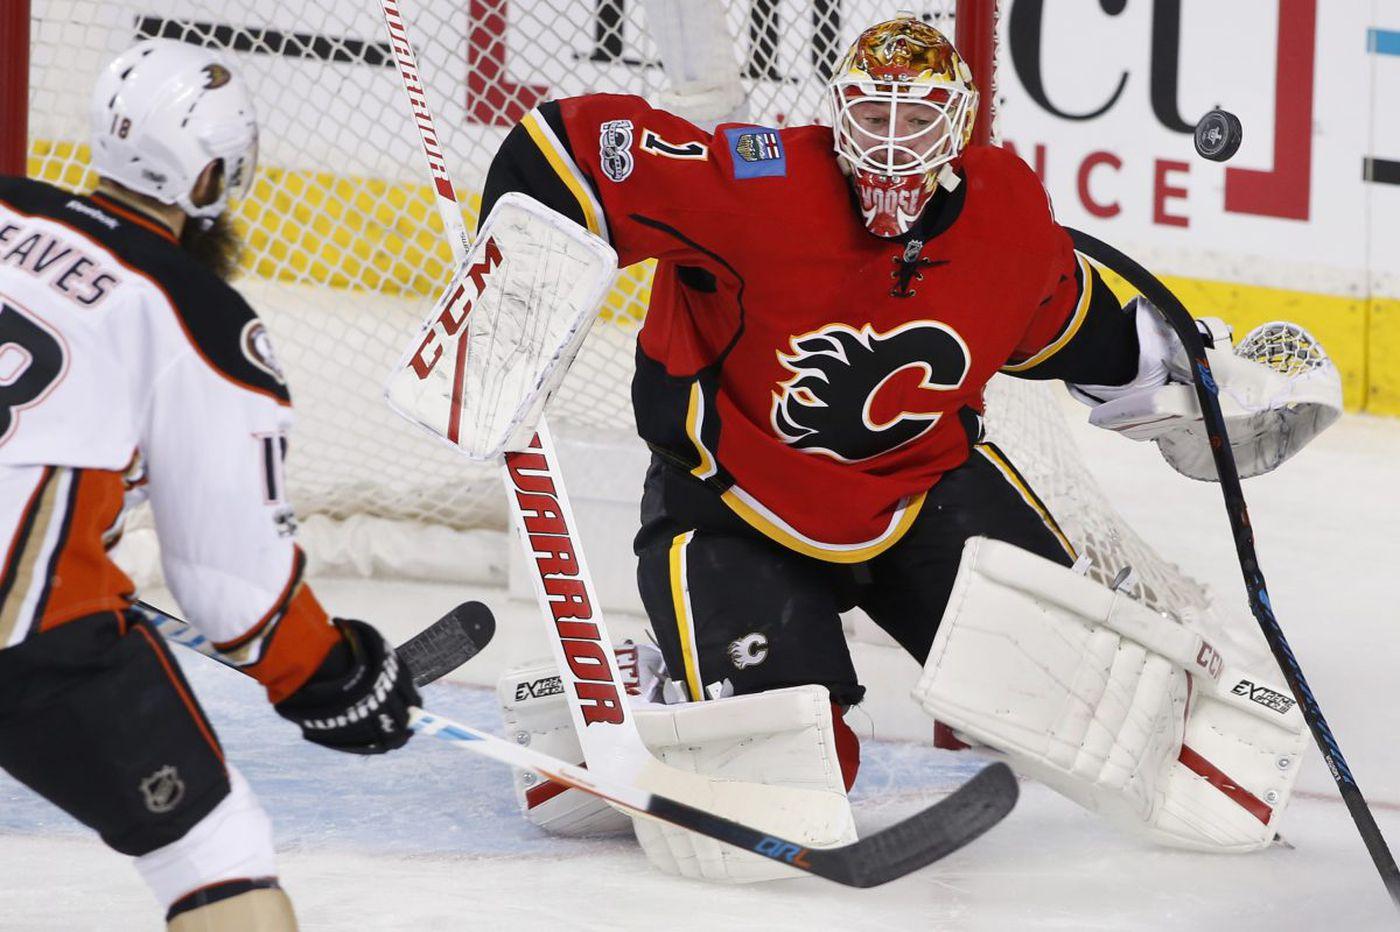 Flyers sign goalie Brian Elliott, hoping he regains St. Louis form